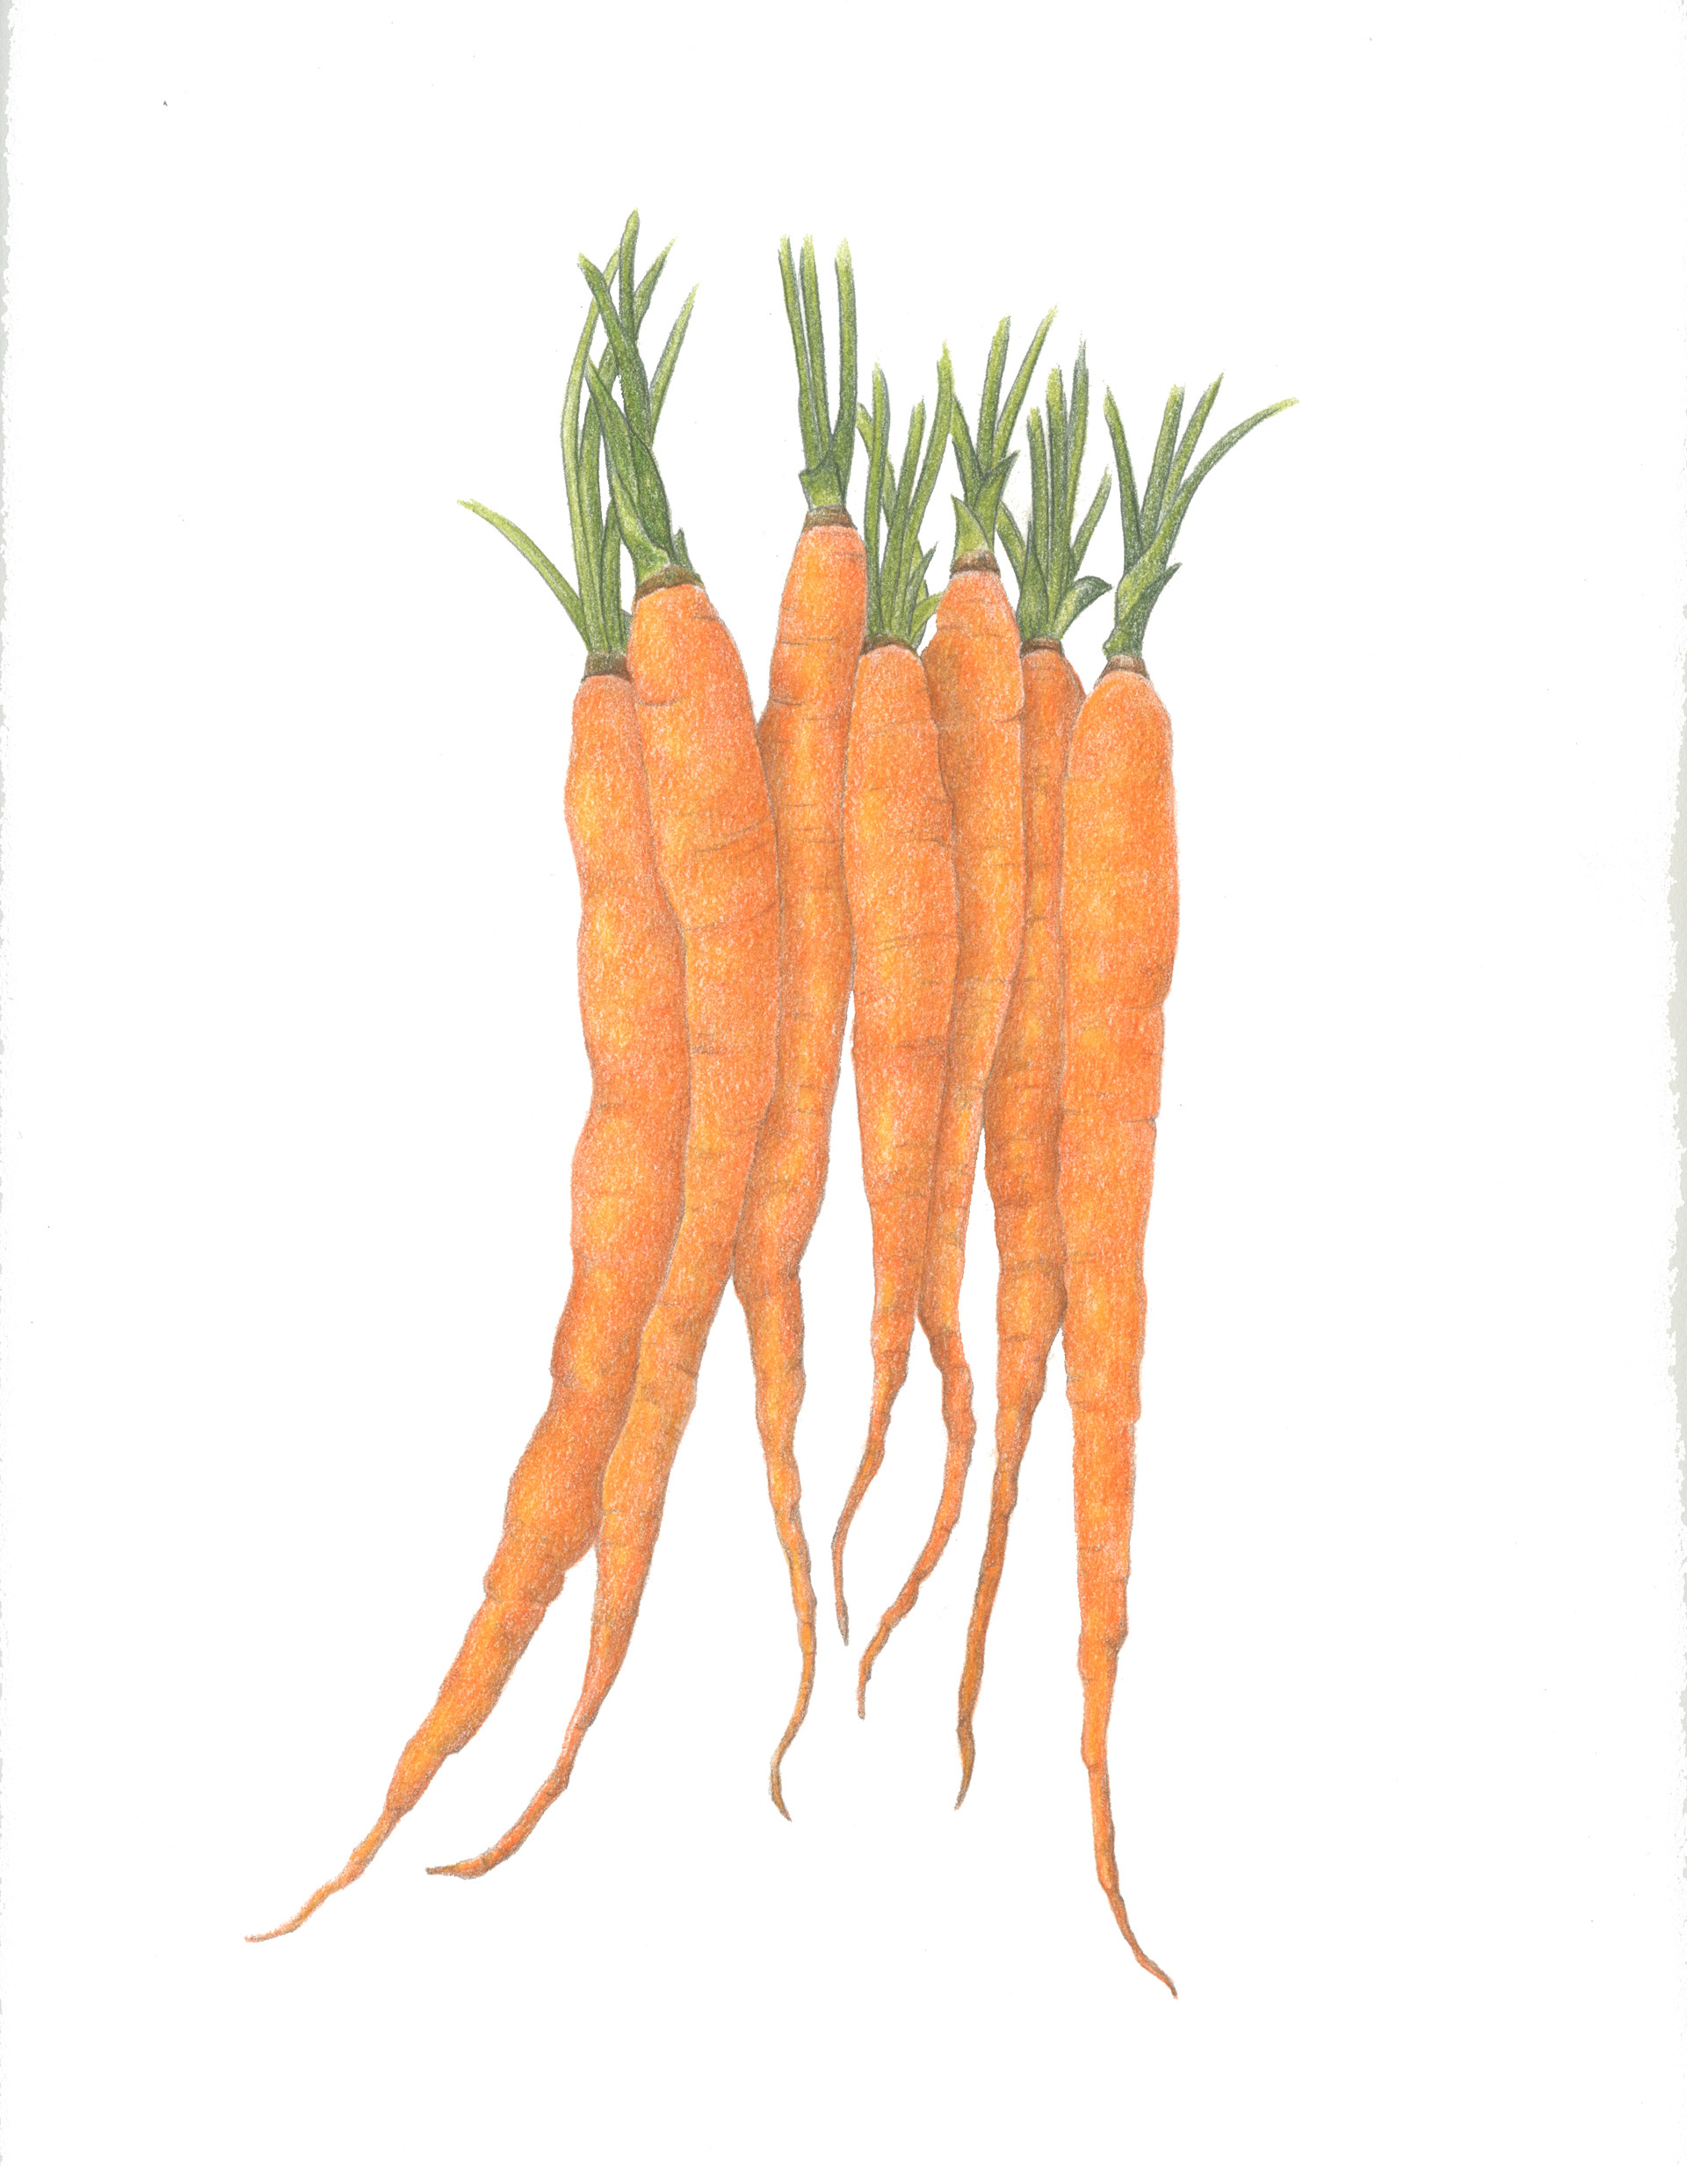 Carrots Alone